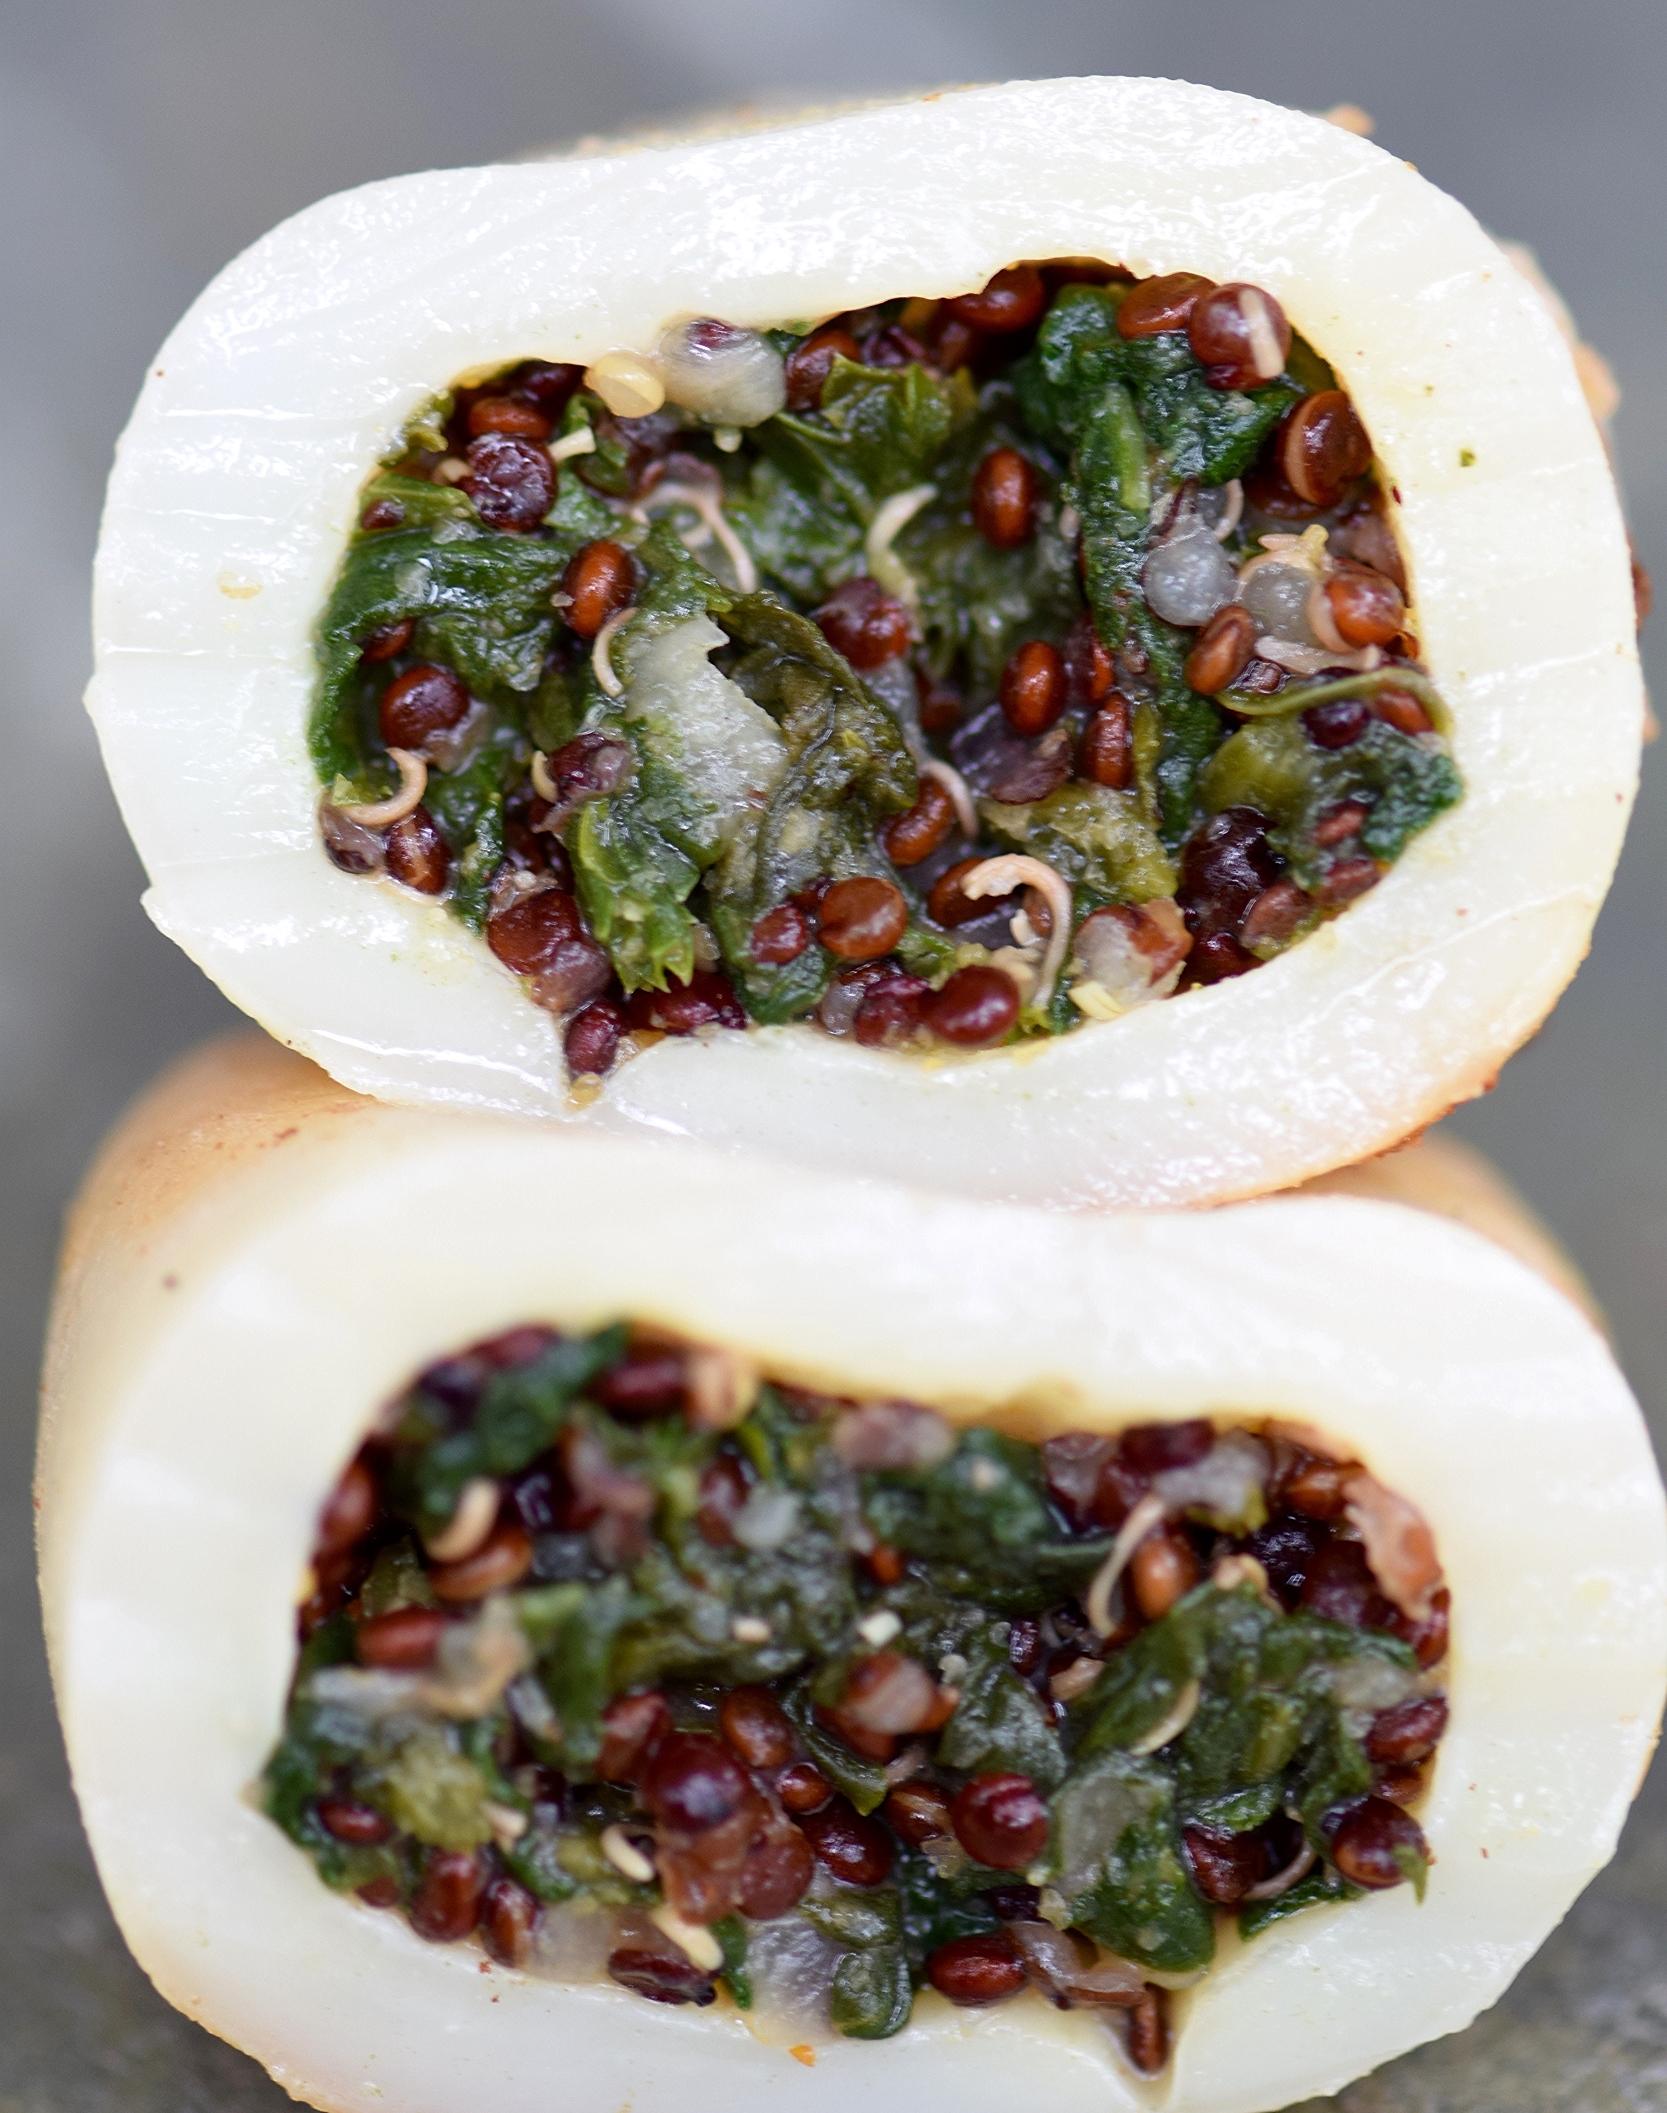 Calamari Stuffed Quinoa and Spinach